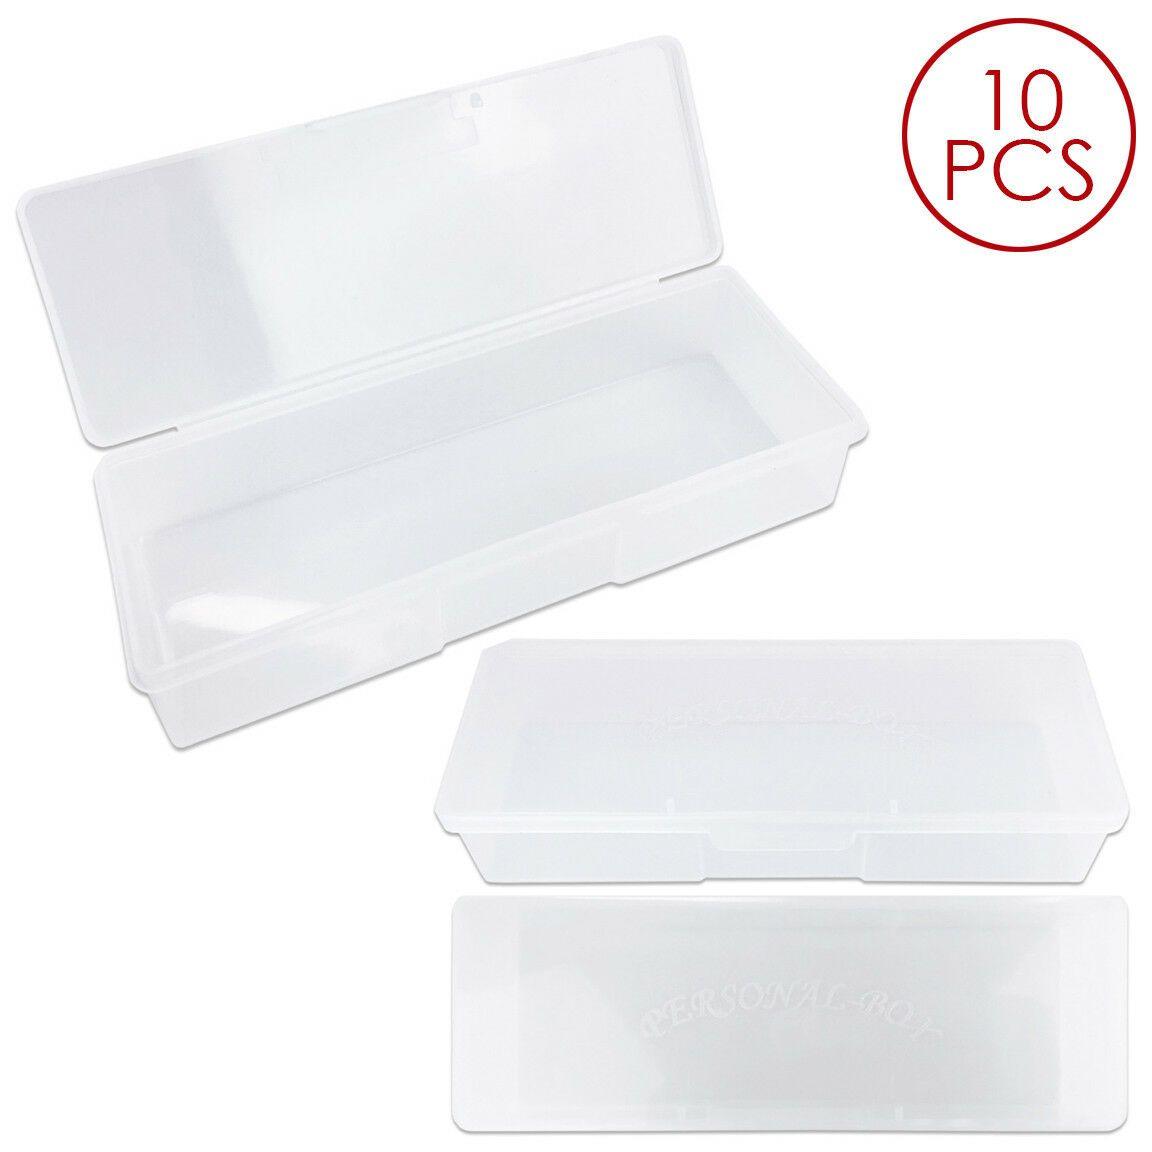 10pcs Large Plastic Manicurists Personal Box Storage Case Container White St Plastic Container Storage Storage Containers Metal Storage Containers